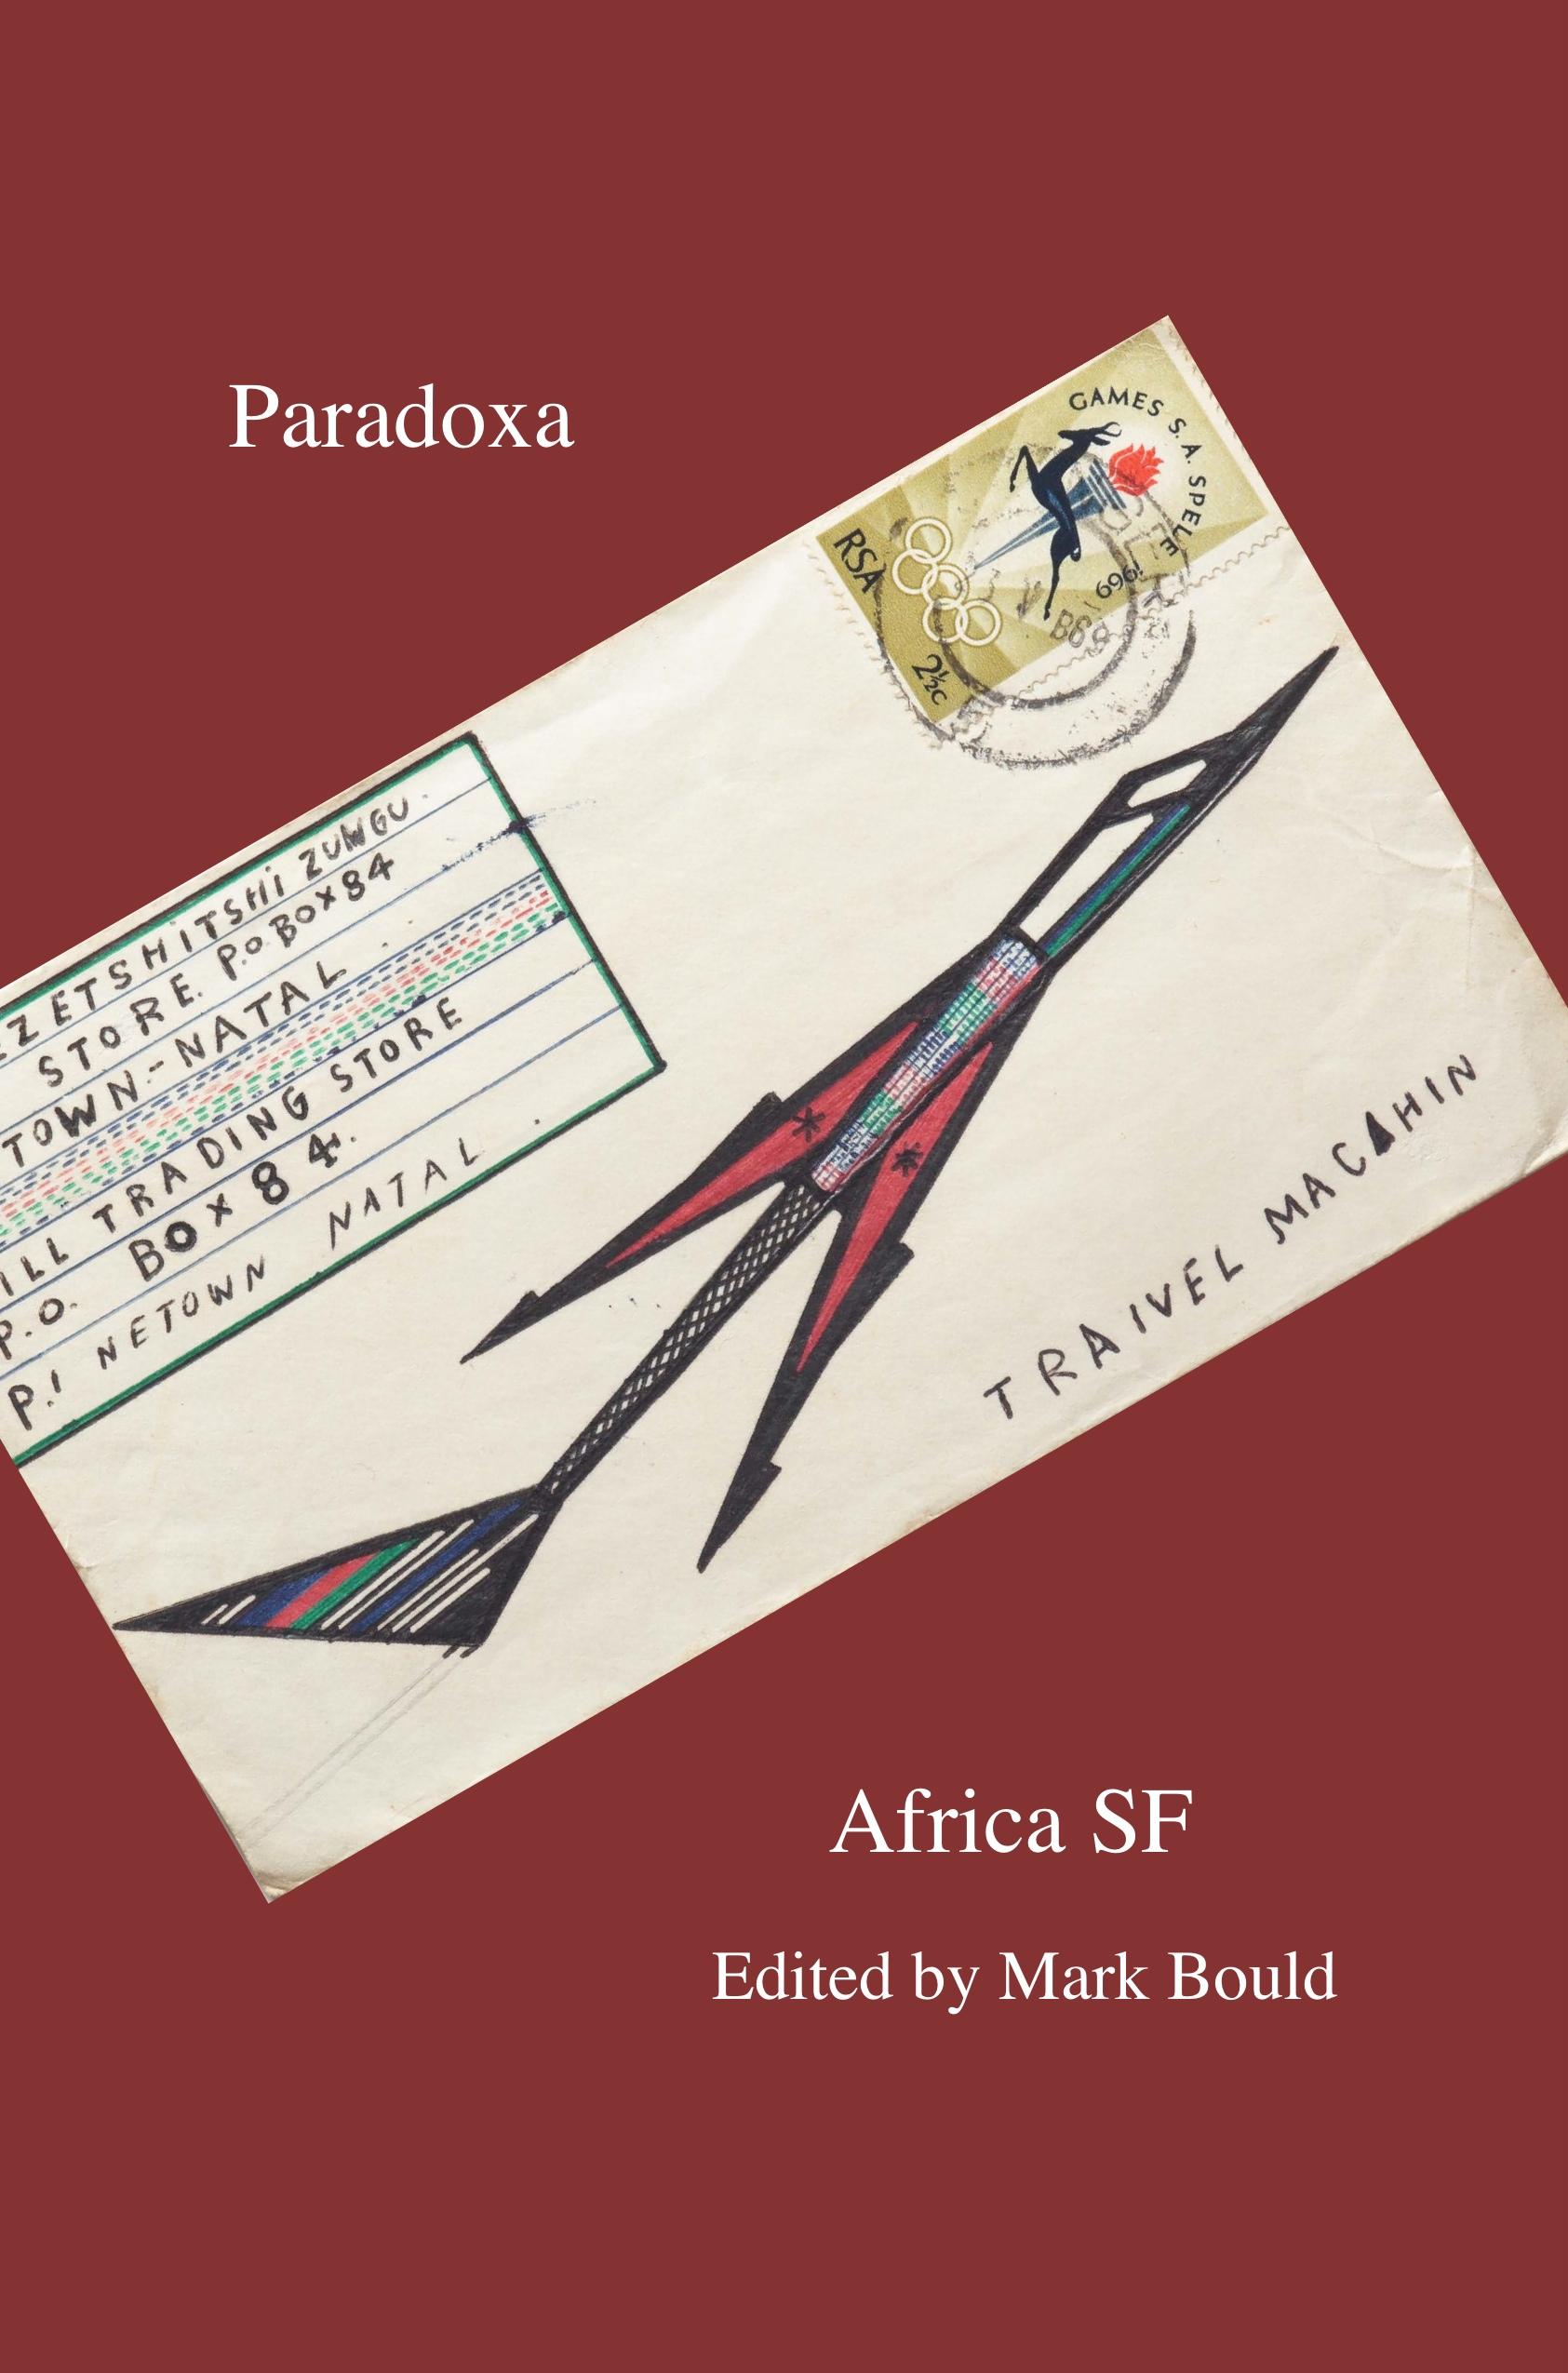 Africa Sf Tawfiq El Hakim Plays